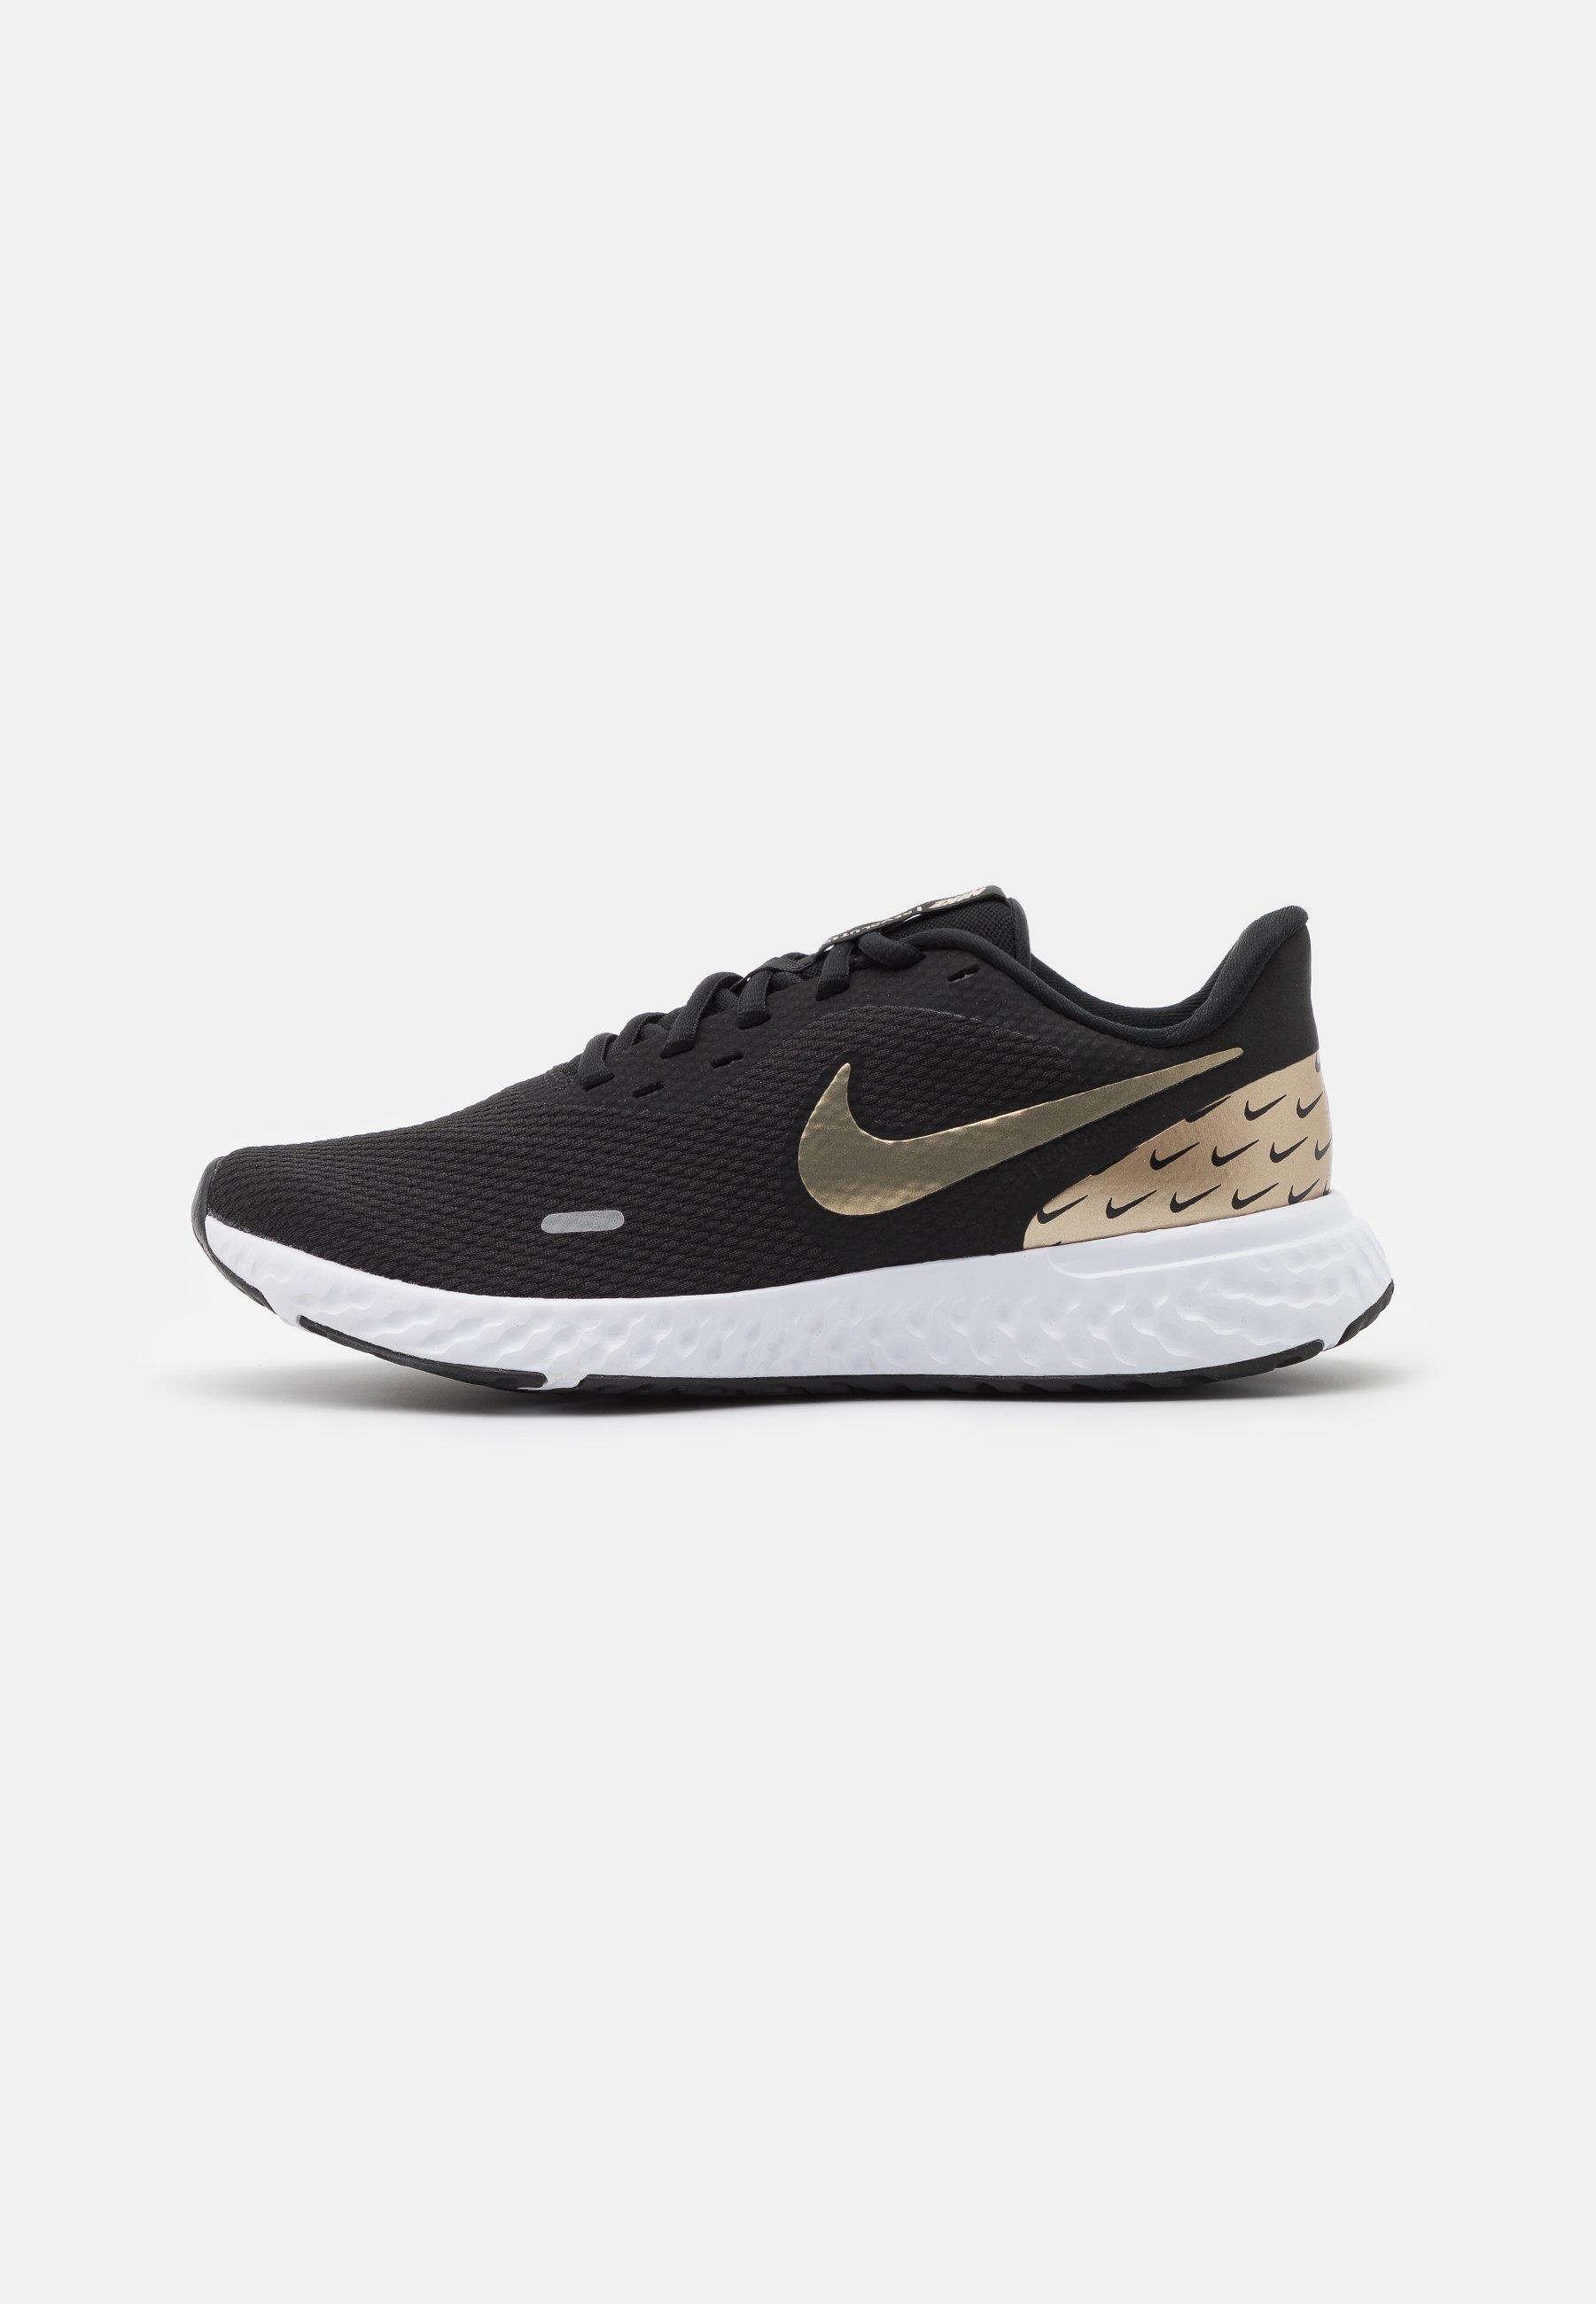 Skor online. Köp dina skor på ZALANDO.se